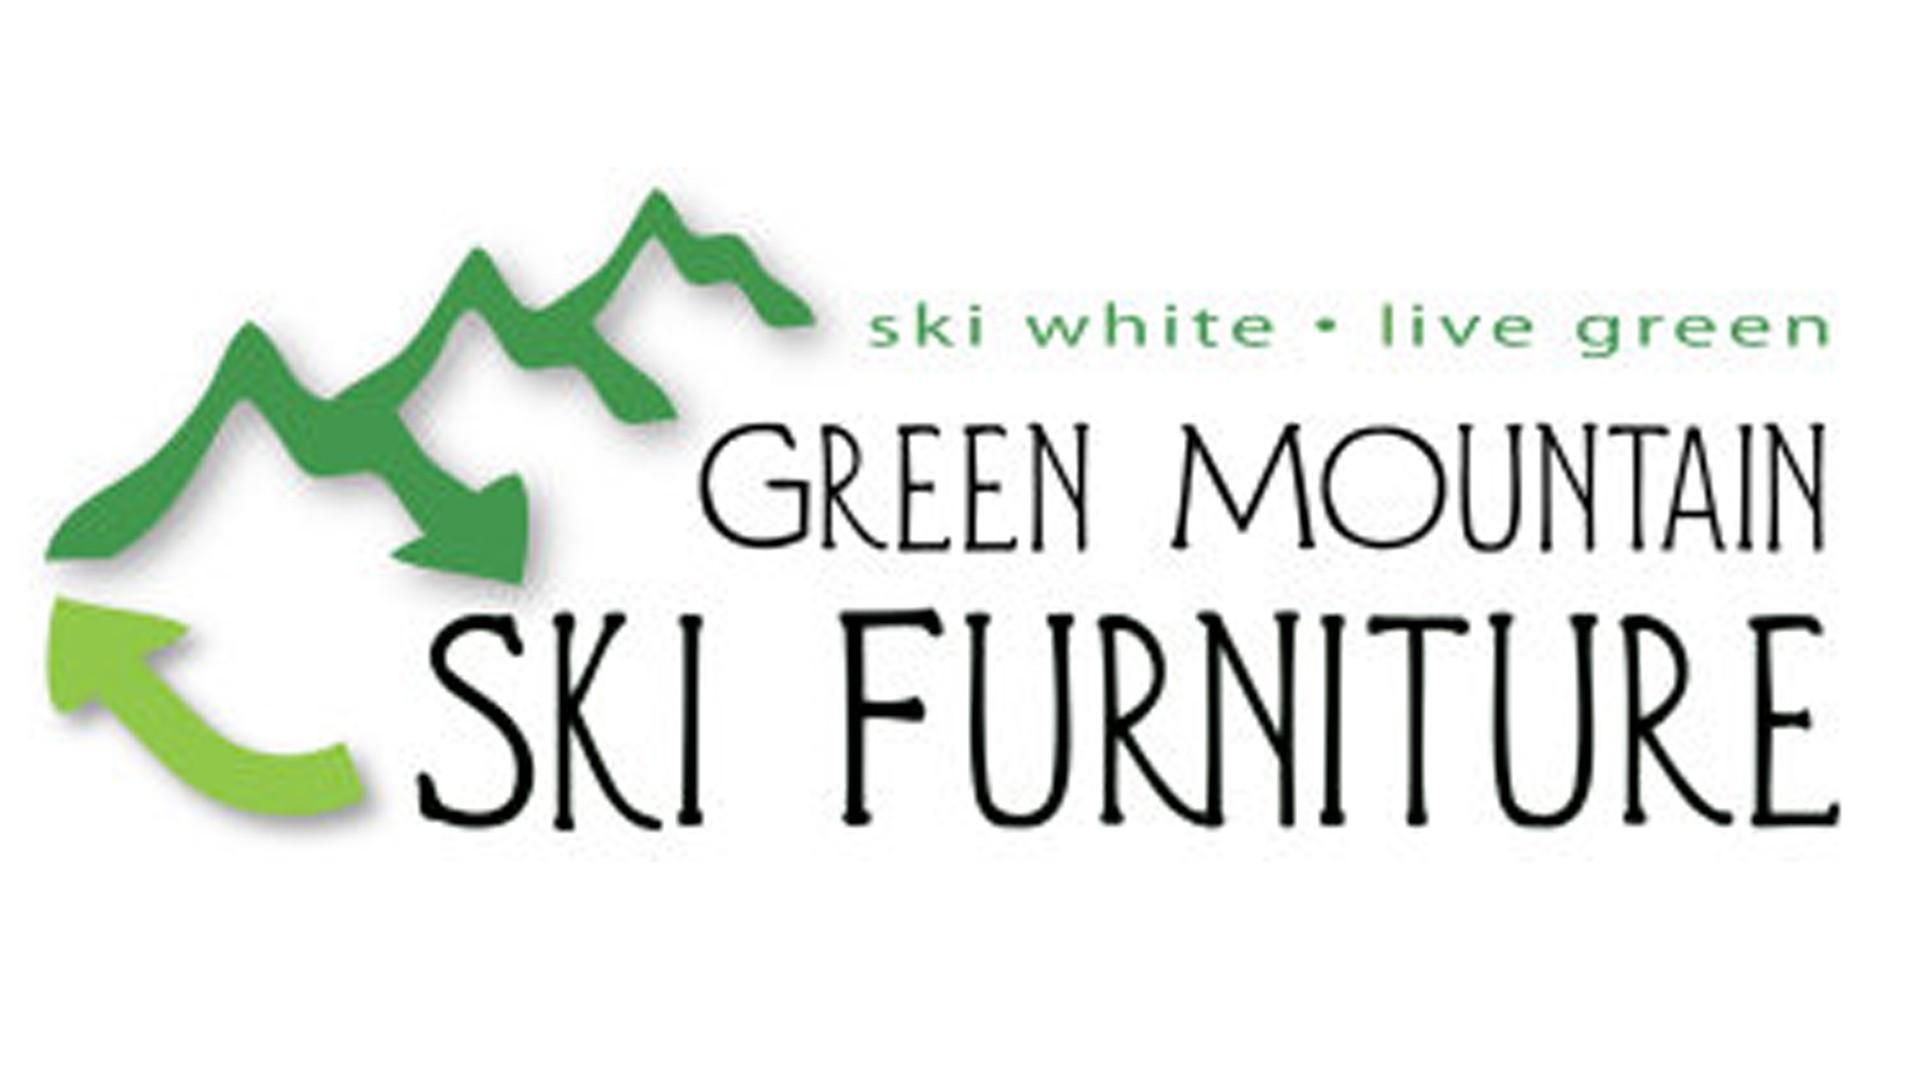 Green Mountain Ski Furniture